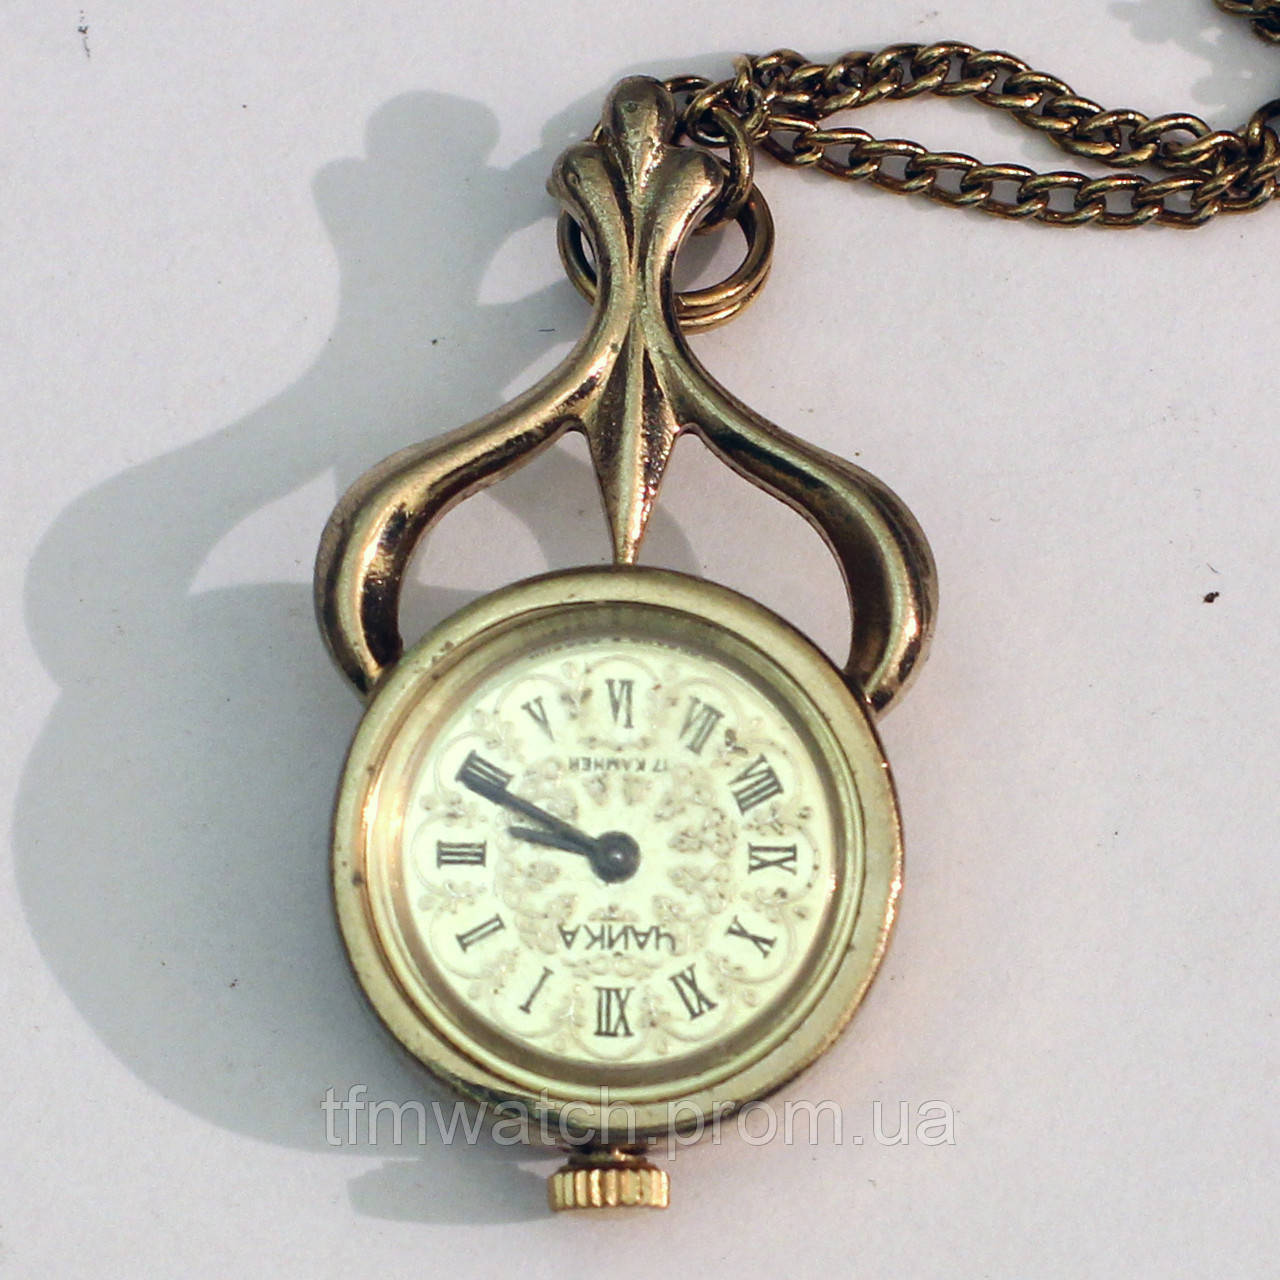 Чайка часы кулон